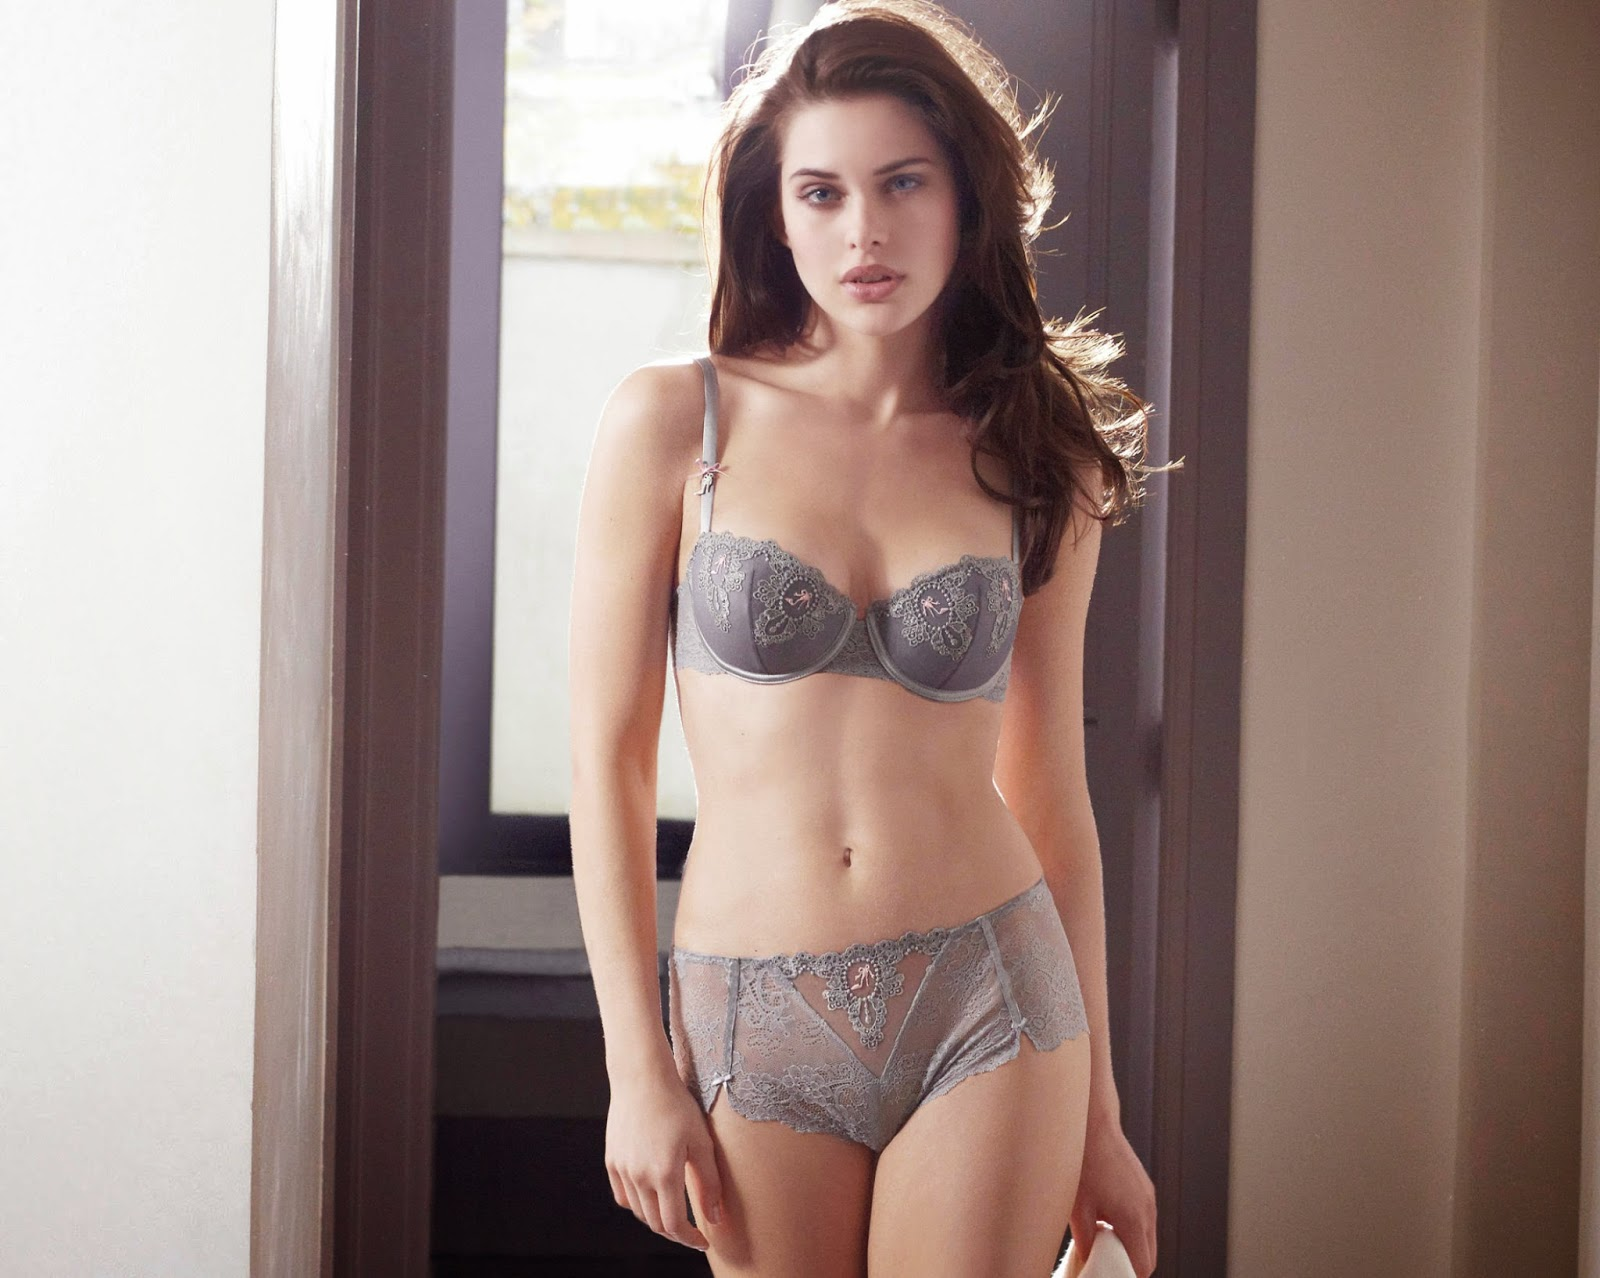 Erotica Pussy Lana Zakocela  nudes (76 photos), Snapchat, braless